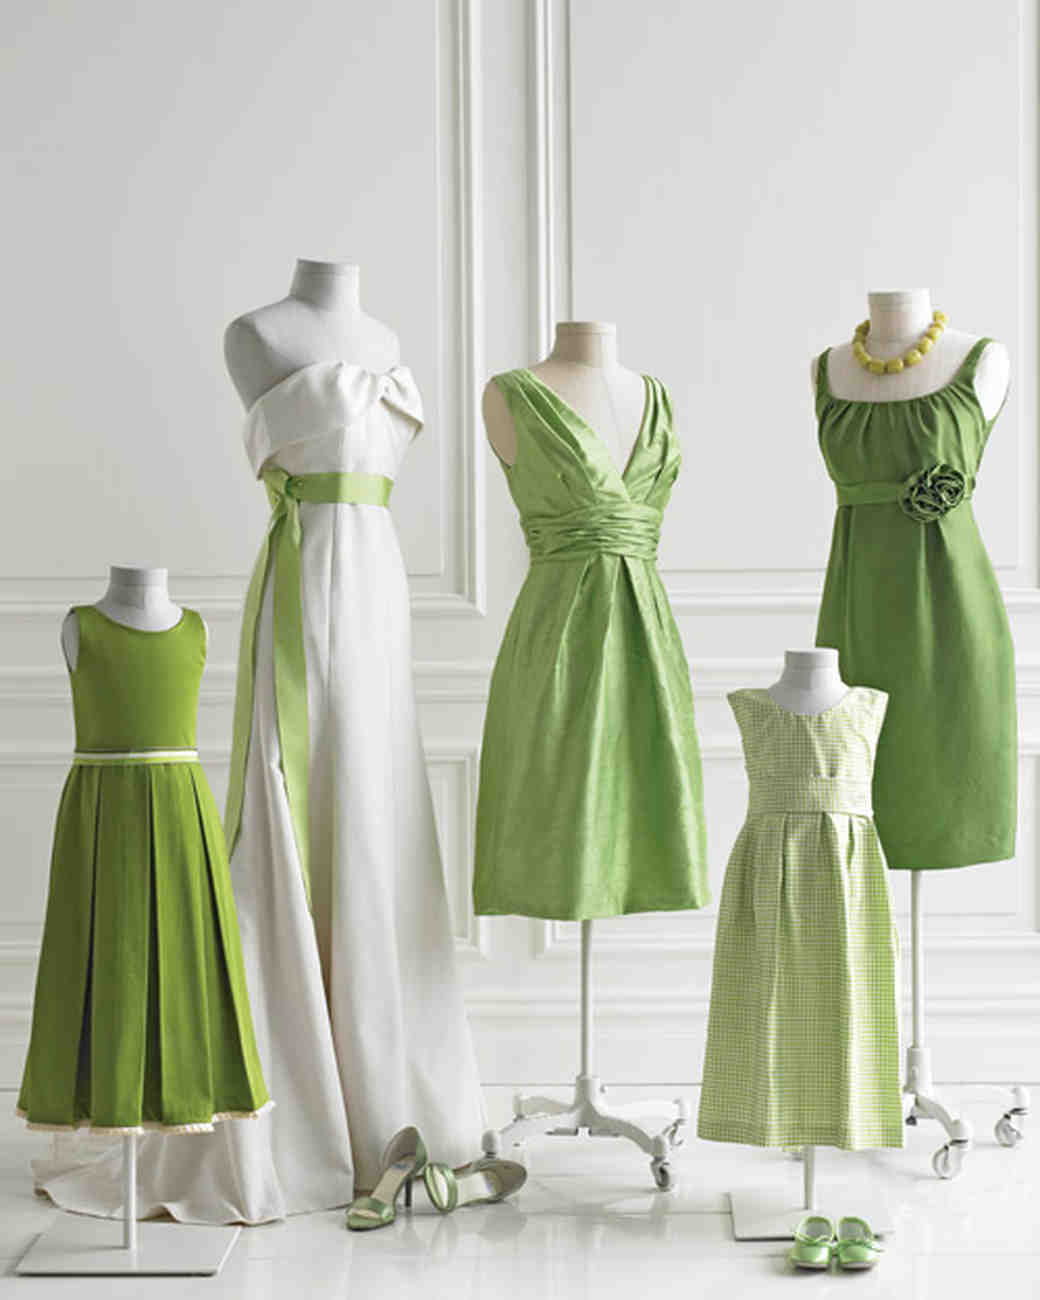 mwd104504_spr09_dresses.jpg